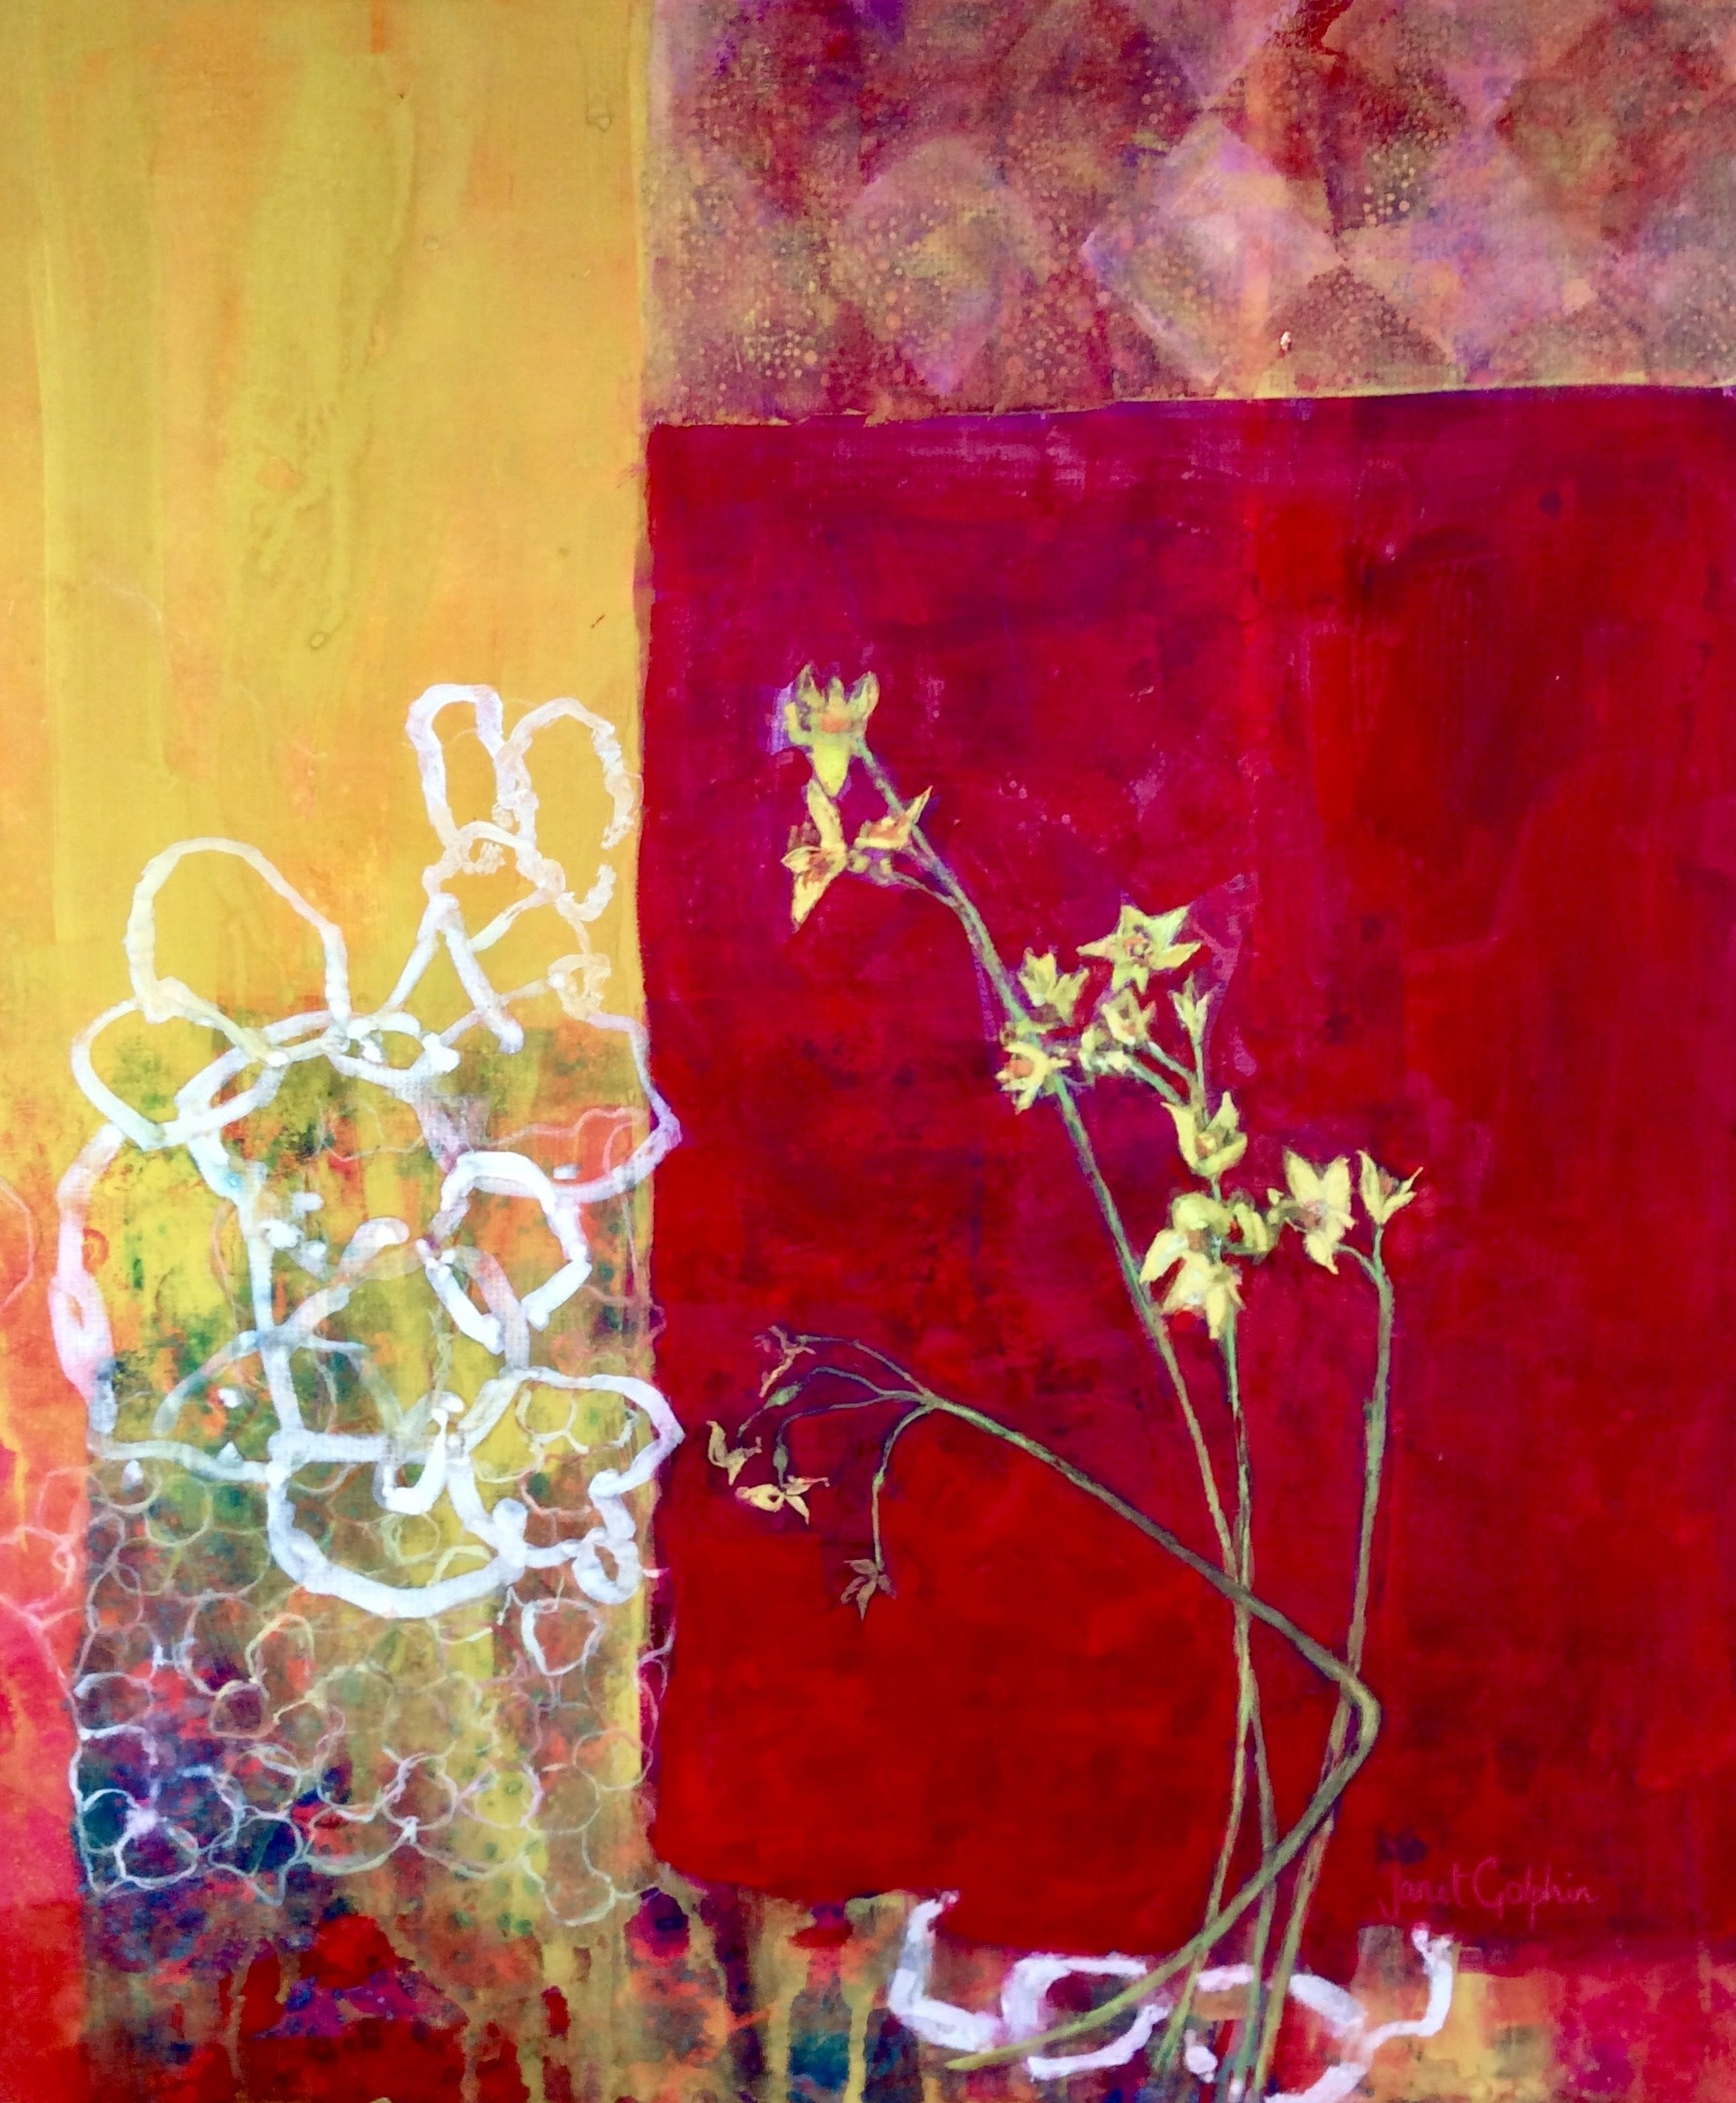 <span class=&#34;link fancybox-details-link&#34;><a href=&#34;/exhibitions/24/works/artworks_standalone10709/&#34;>View Detail Page</a></span><div class=&#34;artist&#34;><span class=&#34;artist&#34;><strong>Janet Golphin</strong></span></div><div class=&#34;title&#34;><em>Cheerfulness</em></div><div class=&#34;medium&#34;>mixed media</div><div class=&#34;dimensions&#34;>81 x 71cm</div>